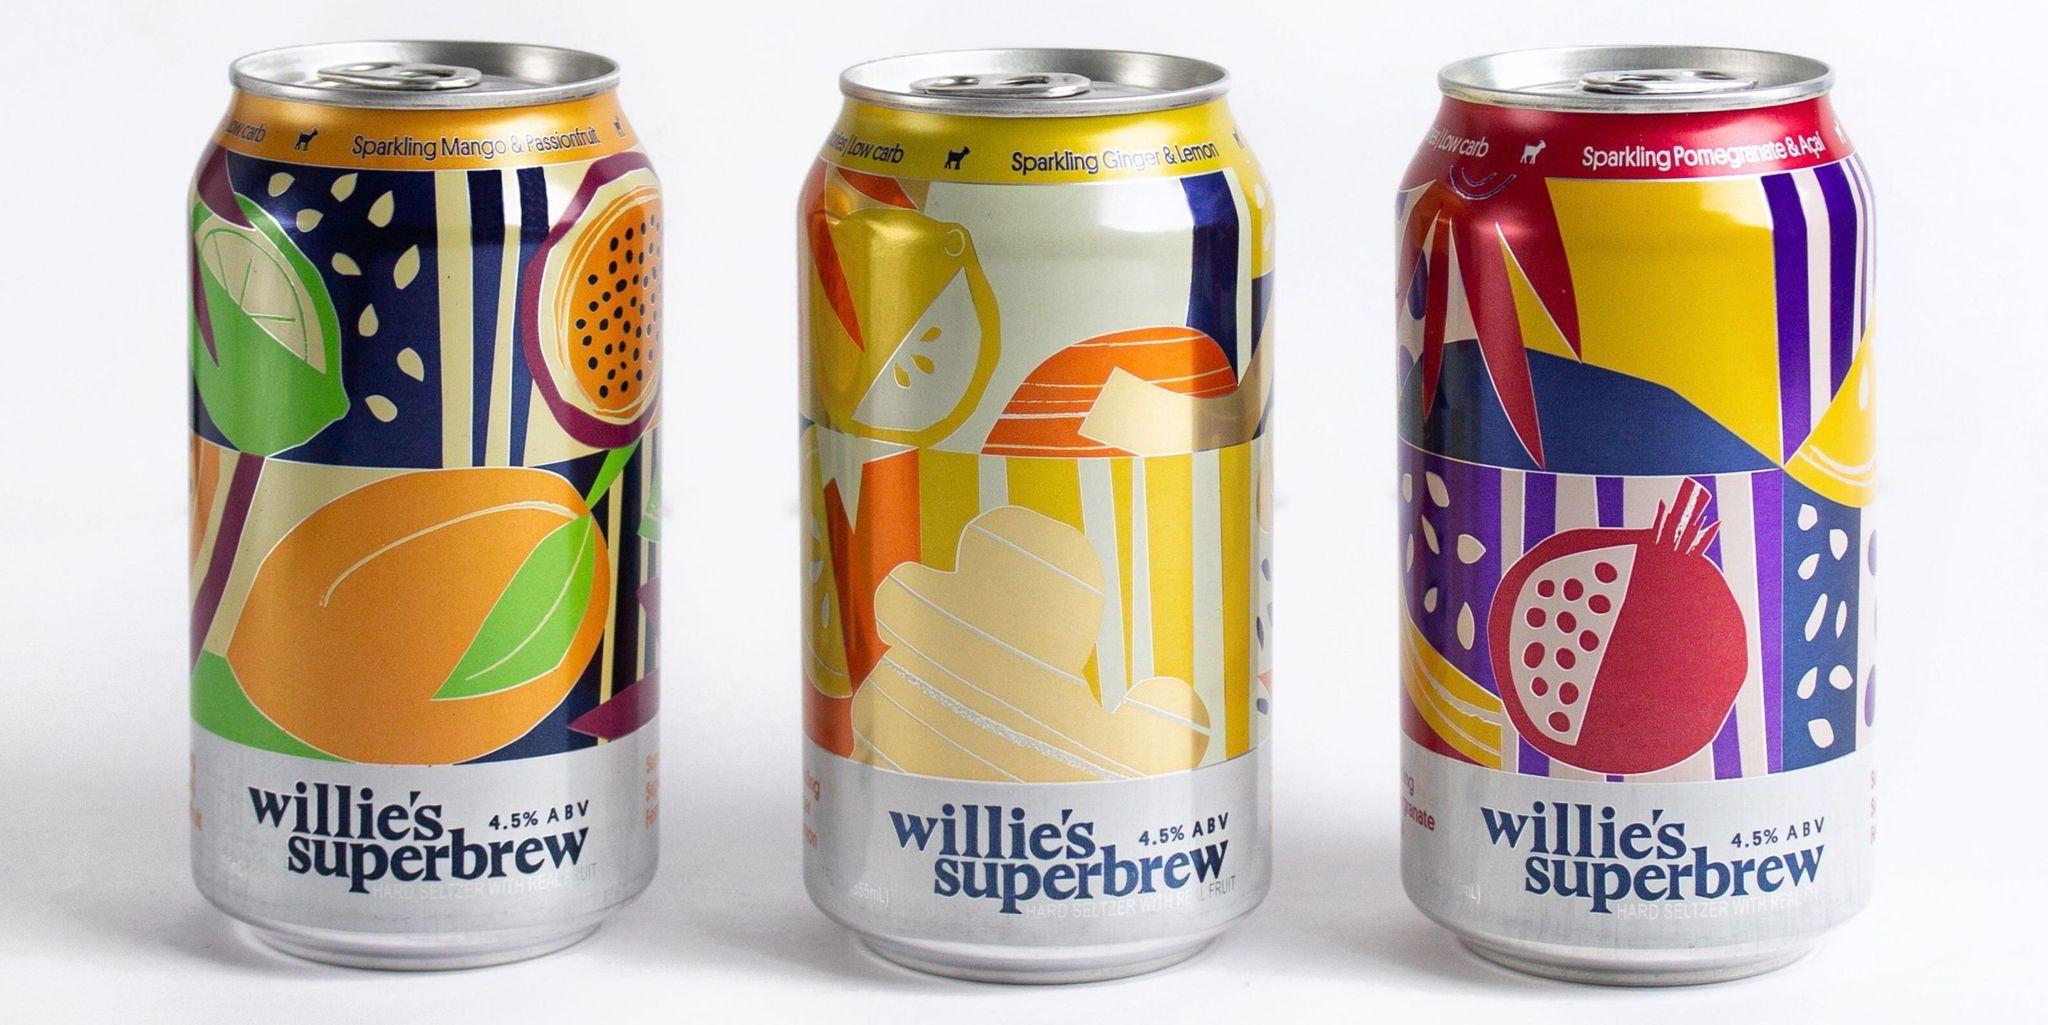 18 Hard Seltzers To Celebrate Summer 2019 S Hottest Beverage